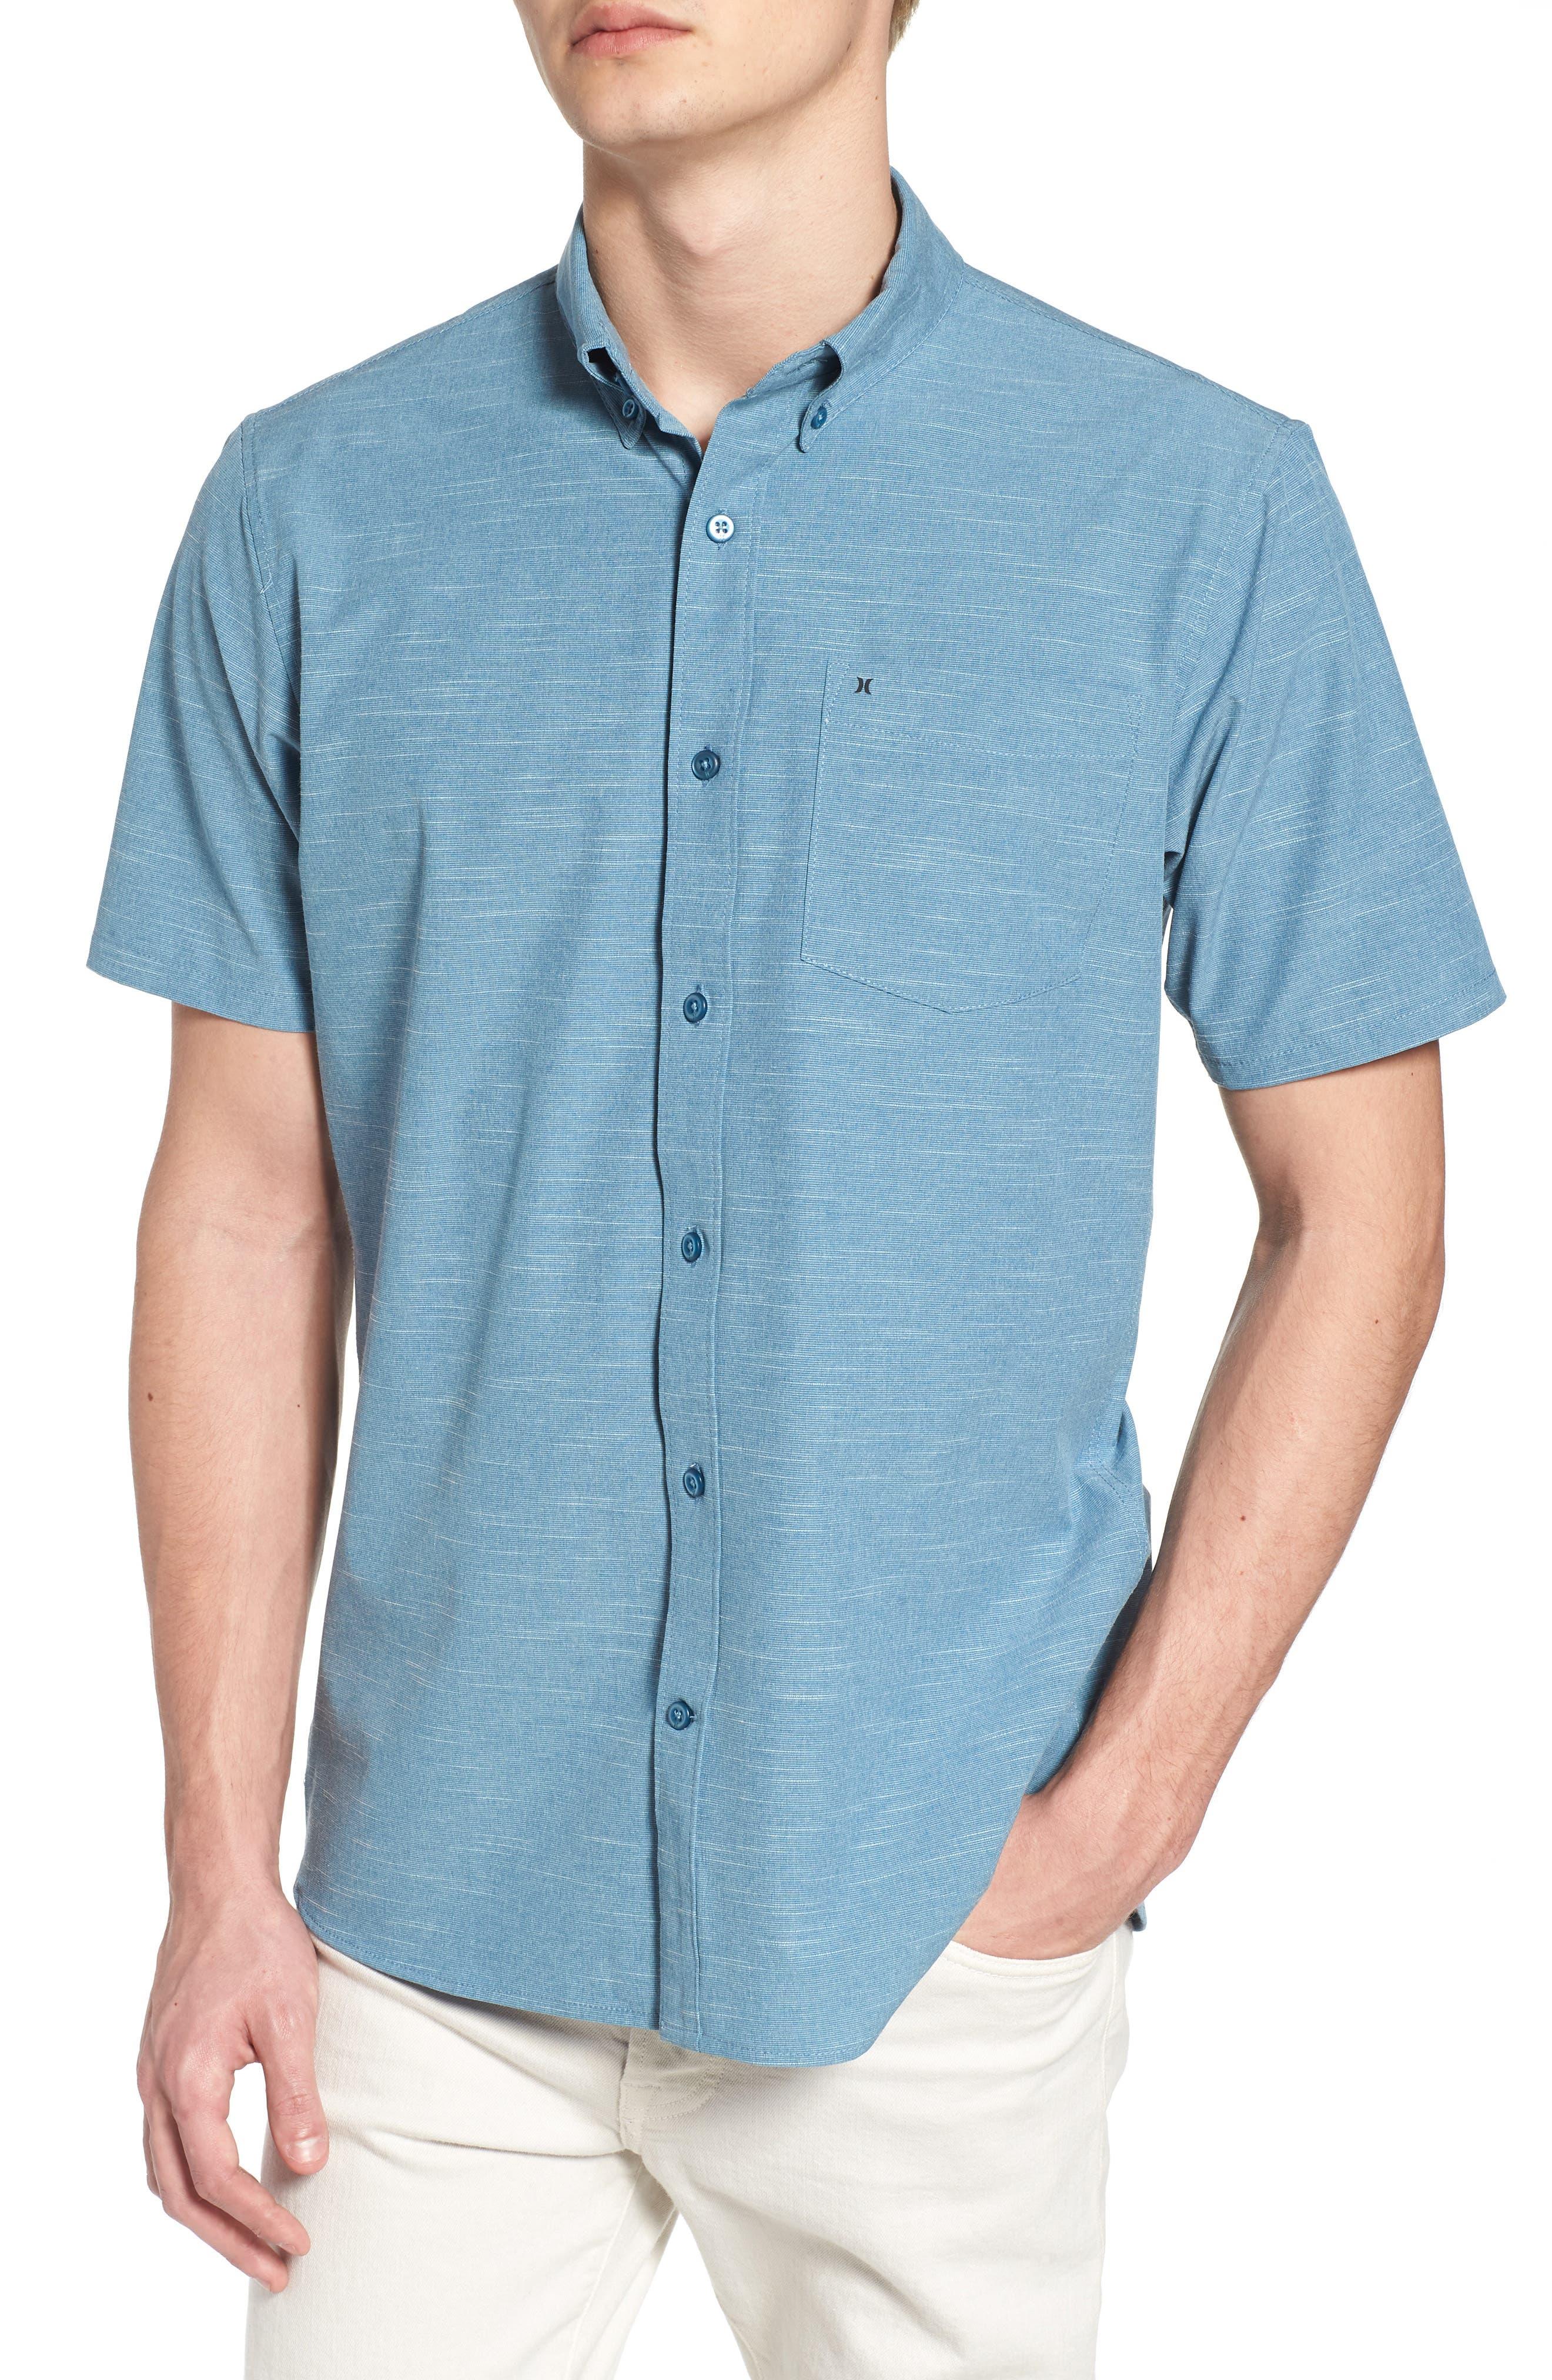 Alchemy Shirt,                         Main,                         color, 407